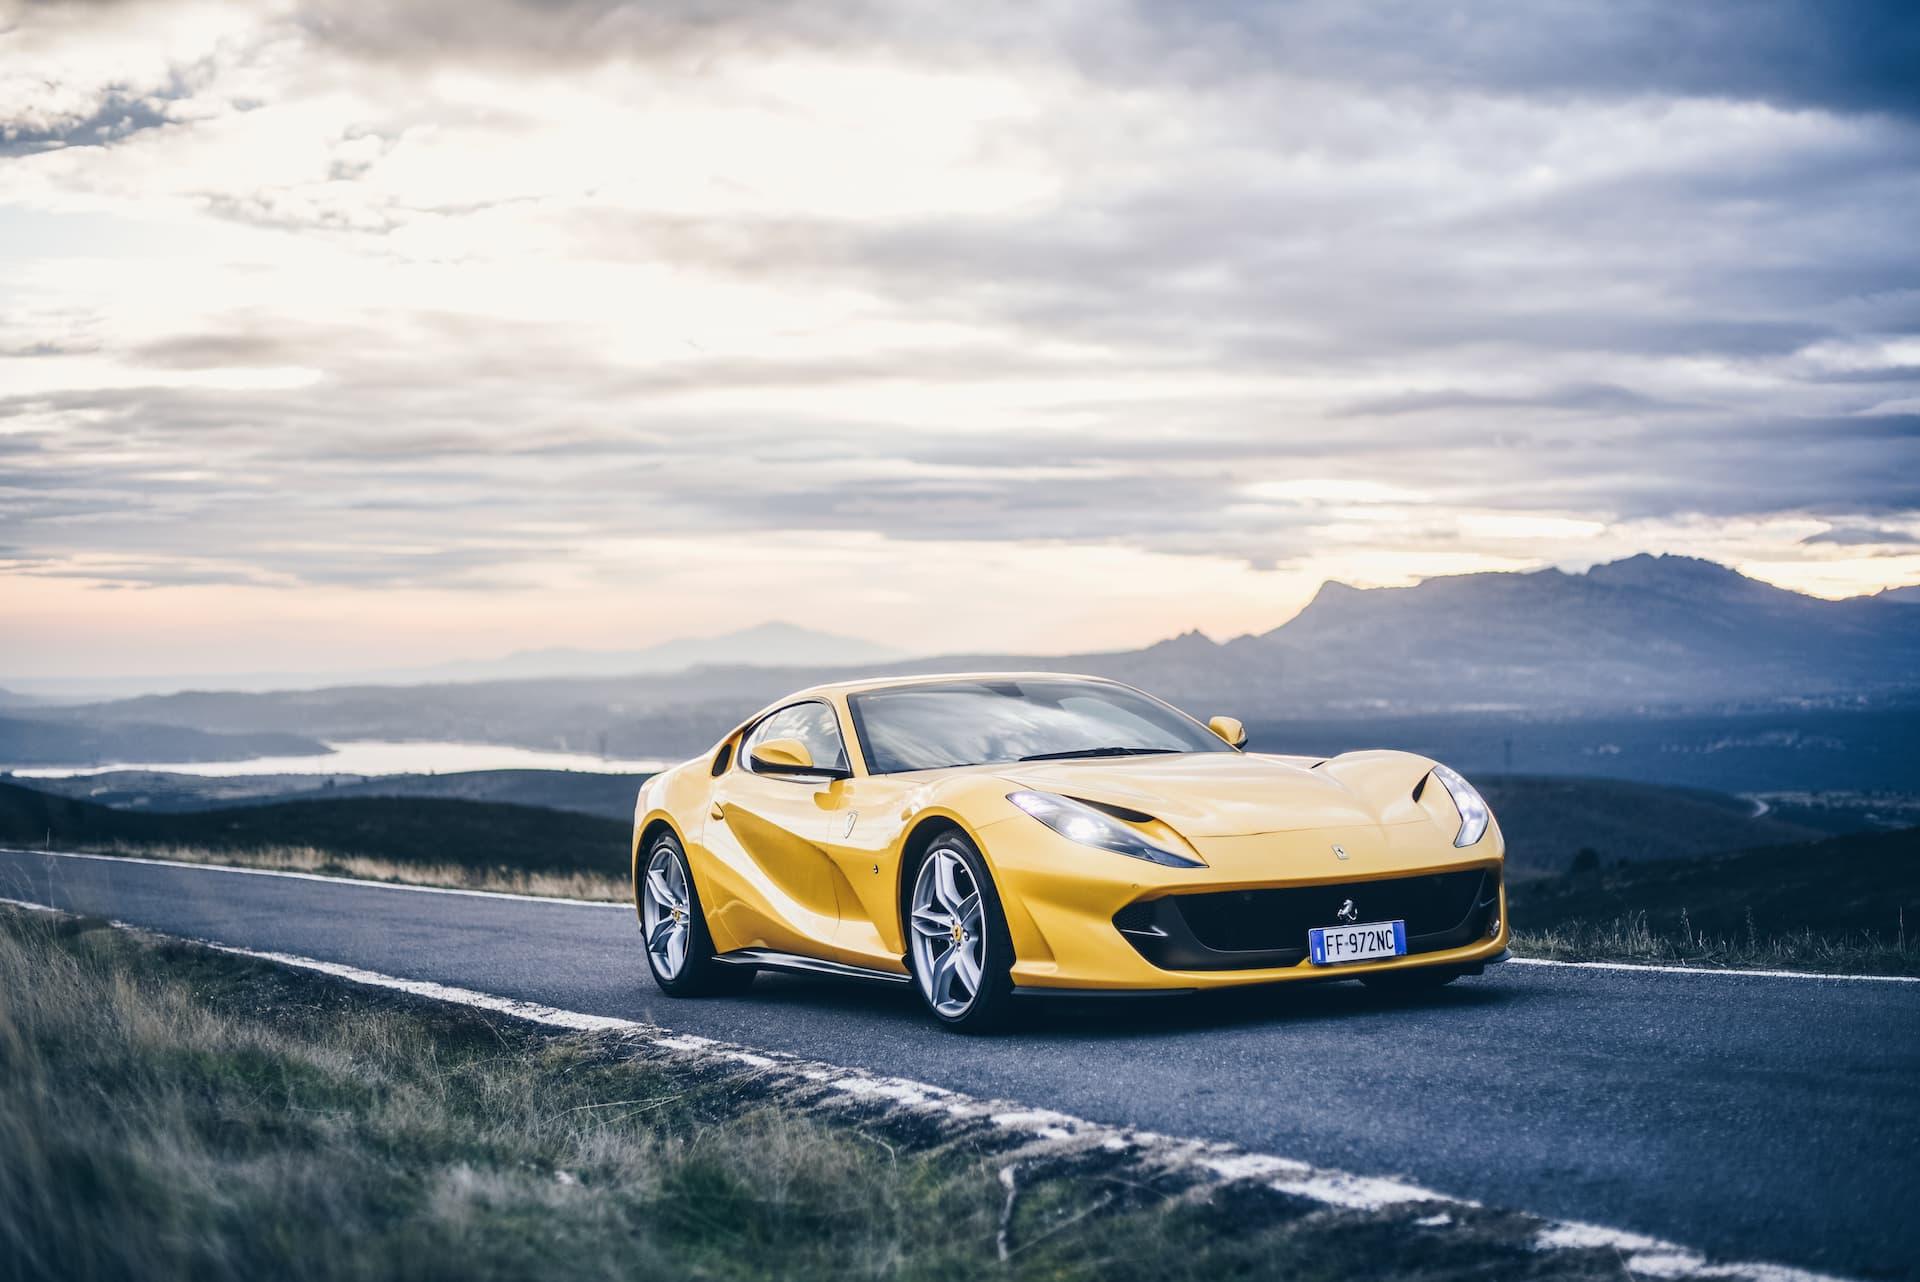 Ferrari Dm 35